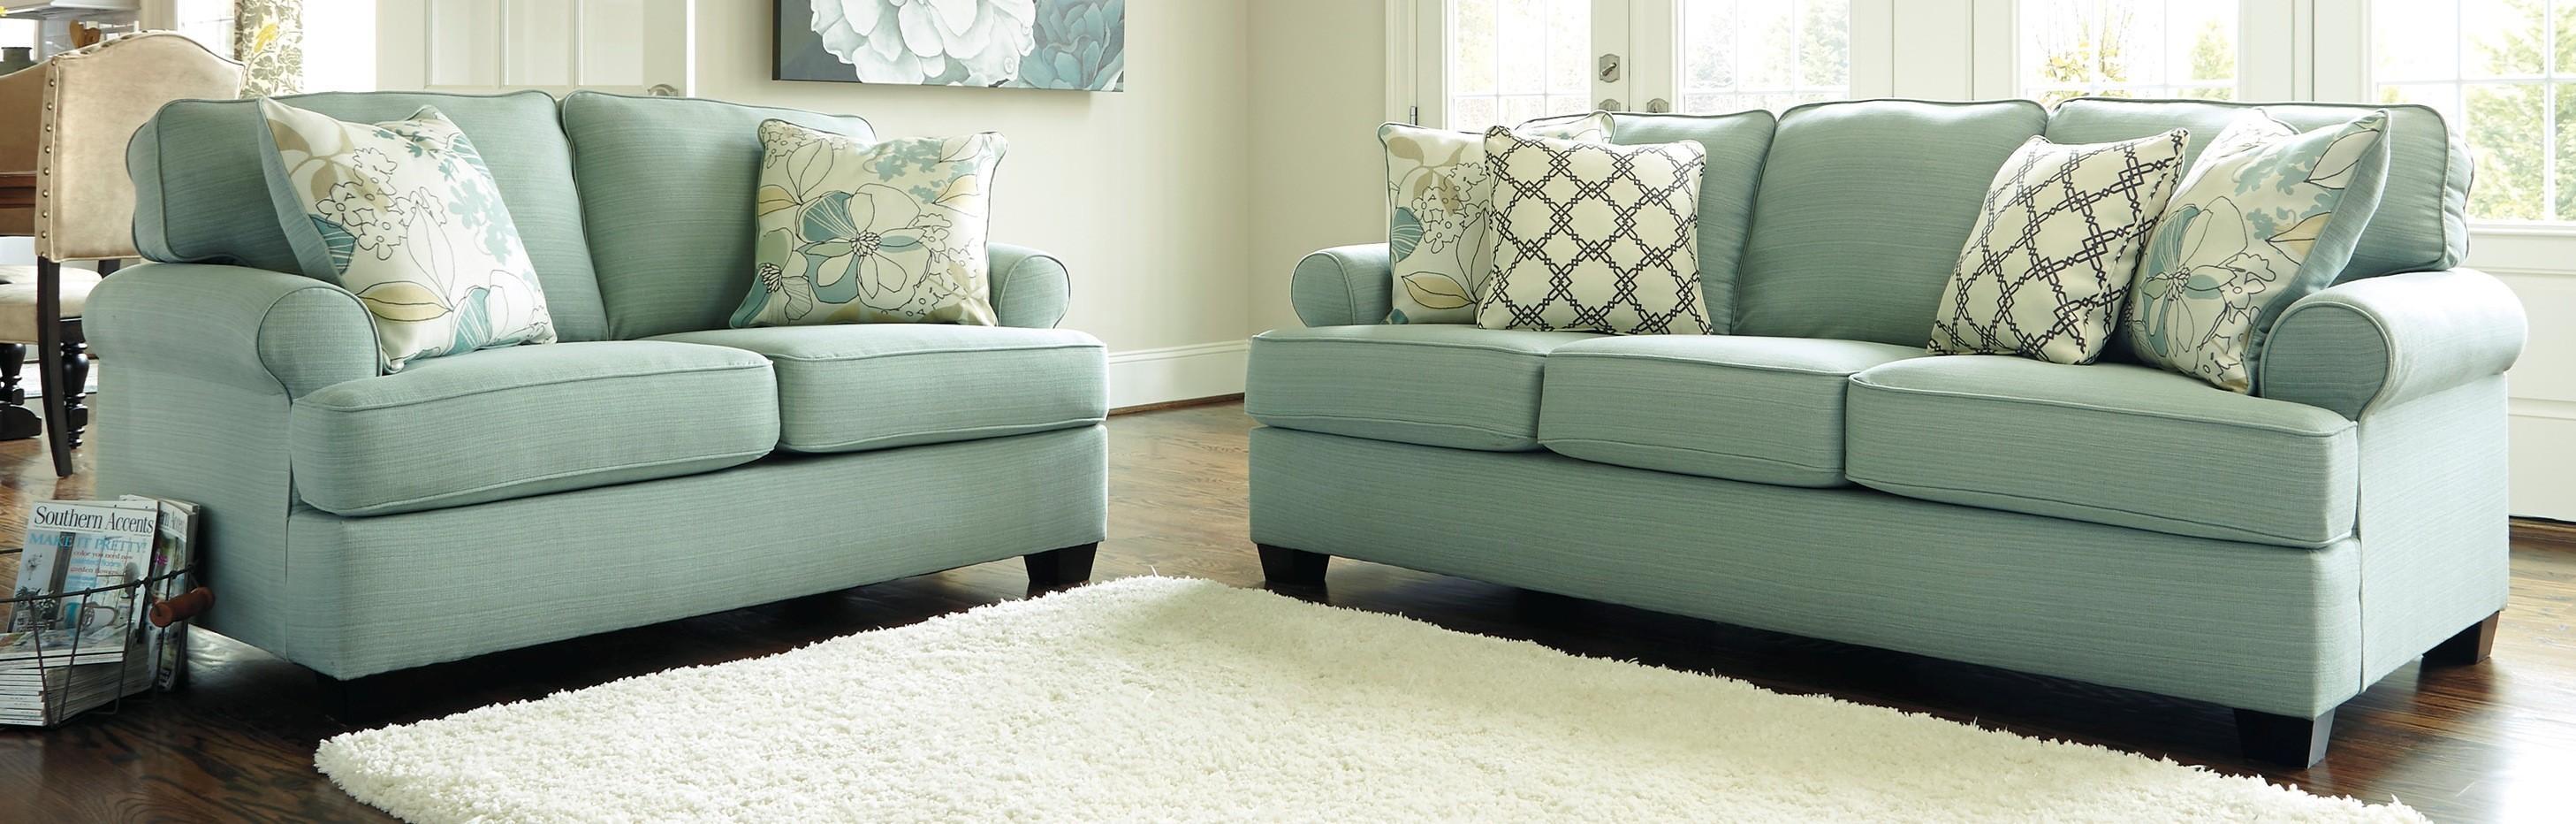 Seafoam Green Sofa | Sofa Gallery | Kengire Inside Seafoam Sofas (Image 14 of 20)